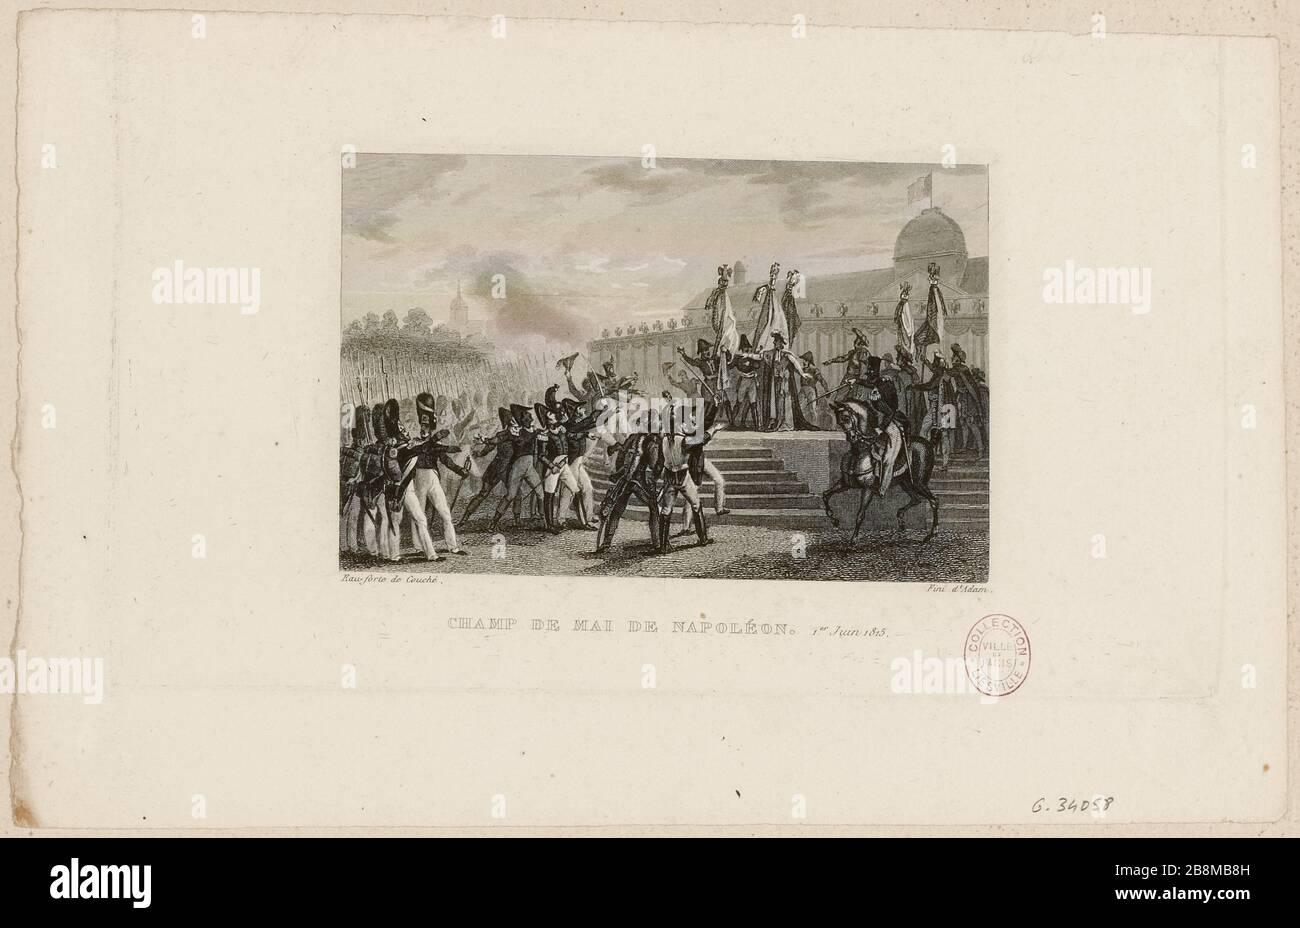 Napoleon 19er Fotos e Imágenes de stock - Alamy